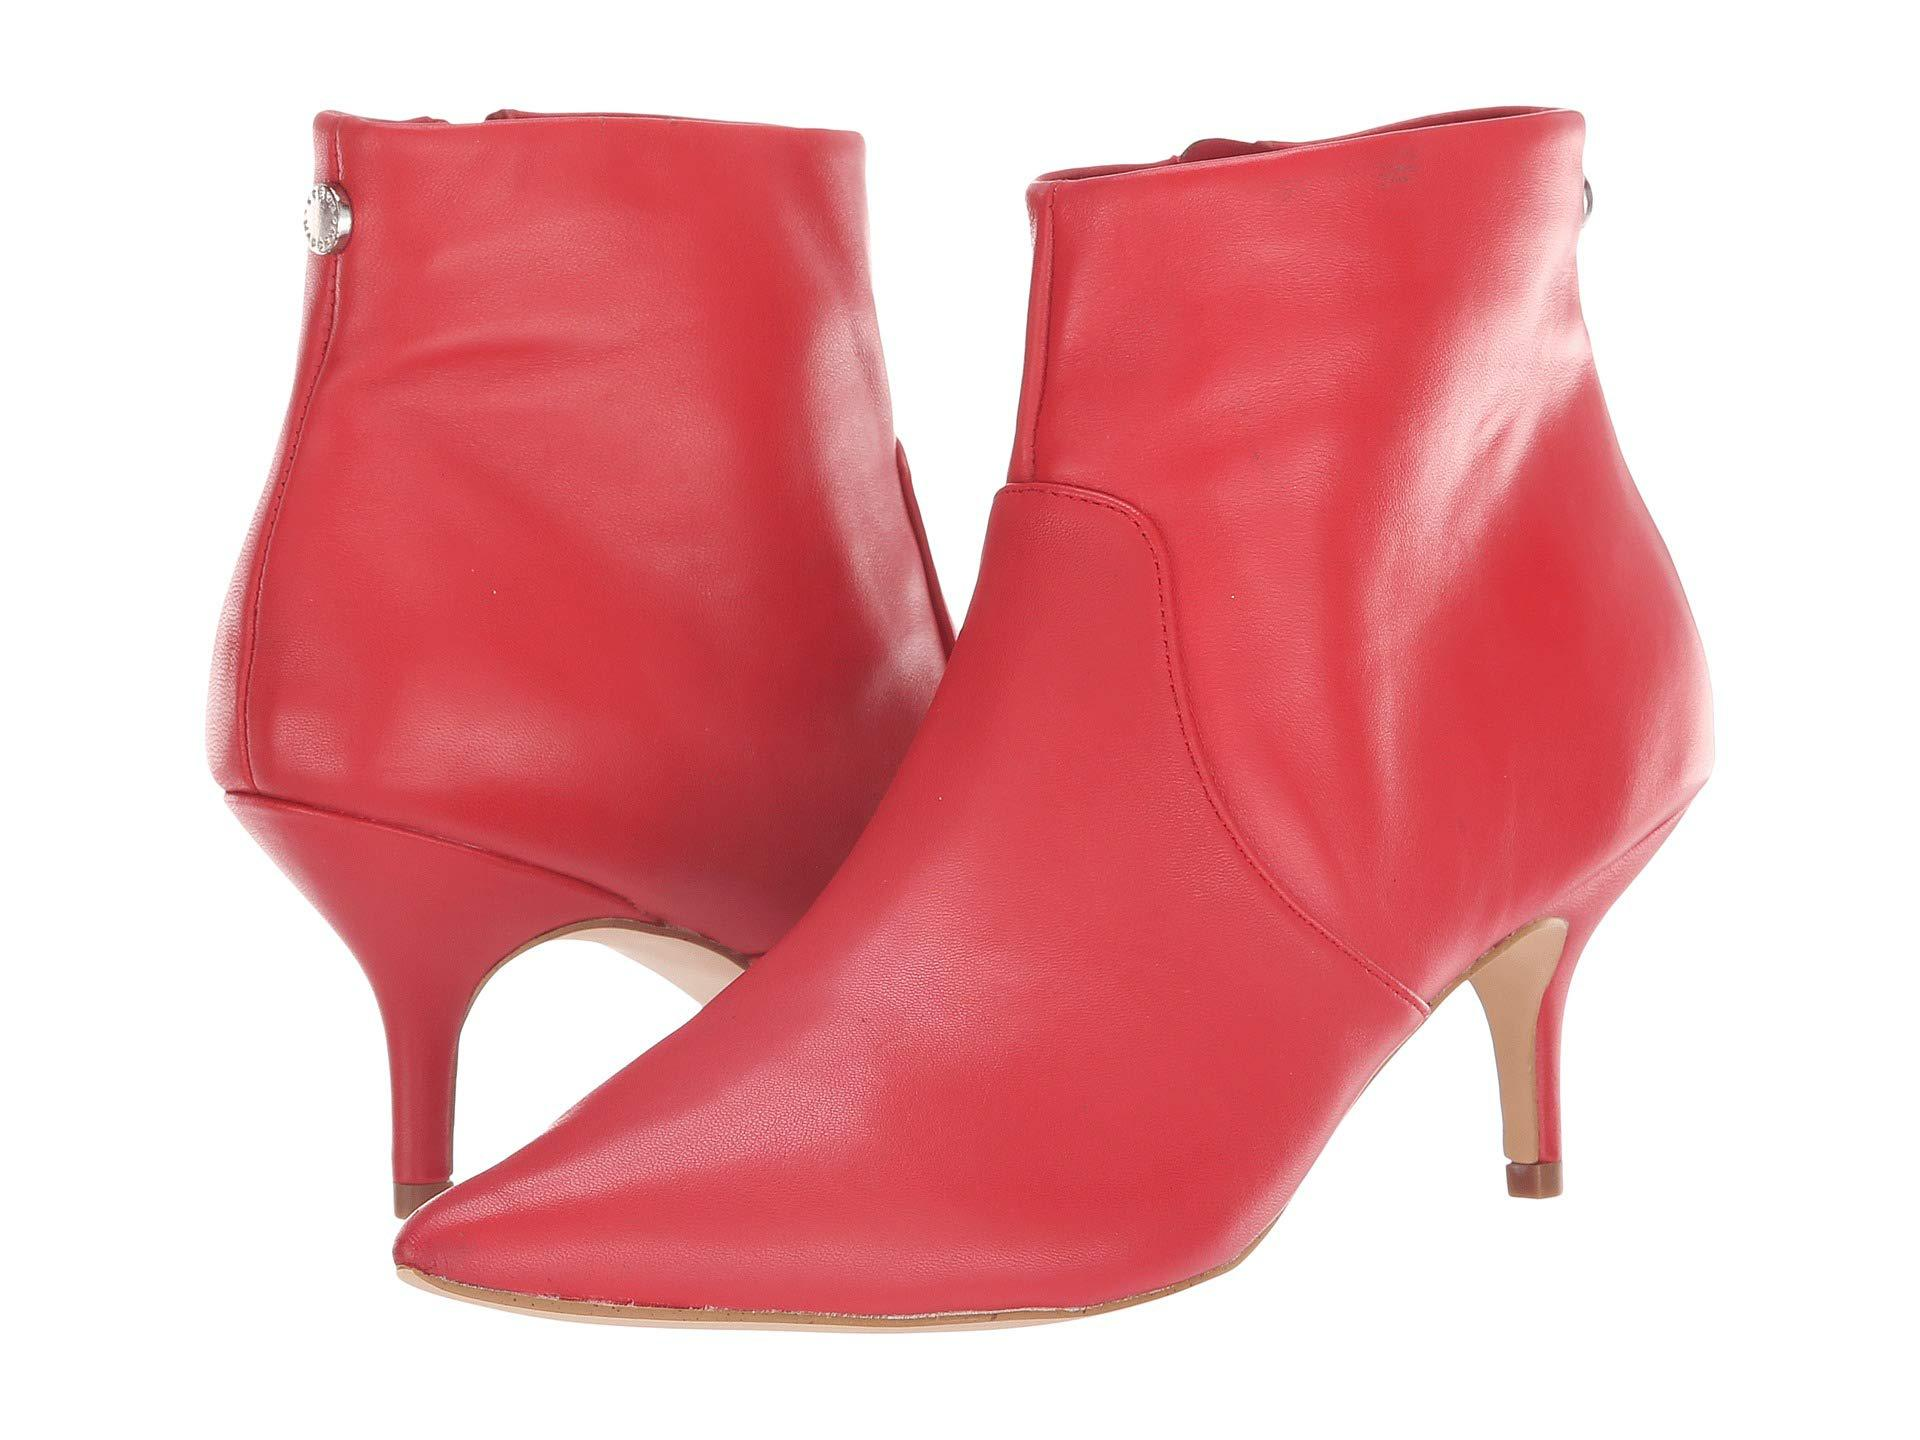 bece1a6181c Lyst - Steve Madden Rome Dress Bootie (white) Women s Pull-on Boots ...